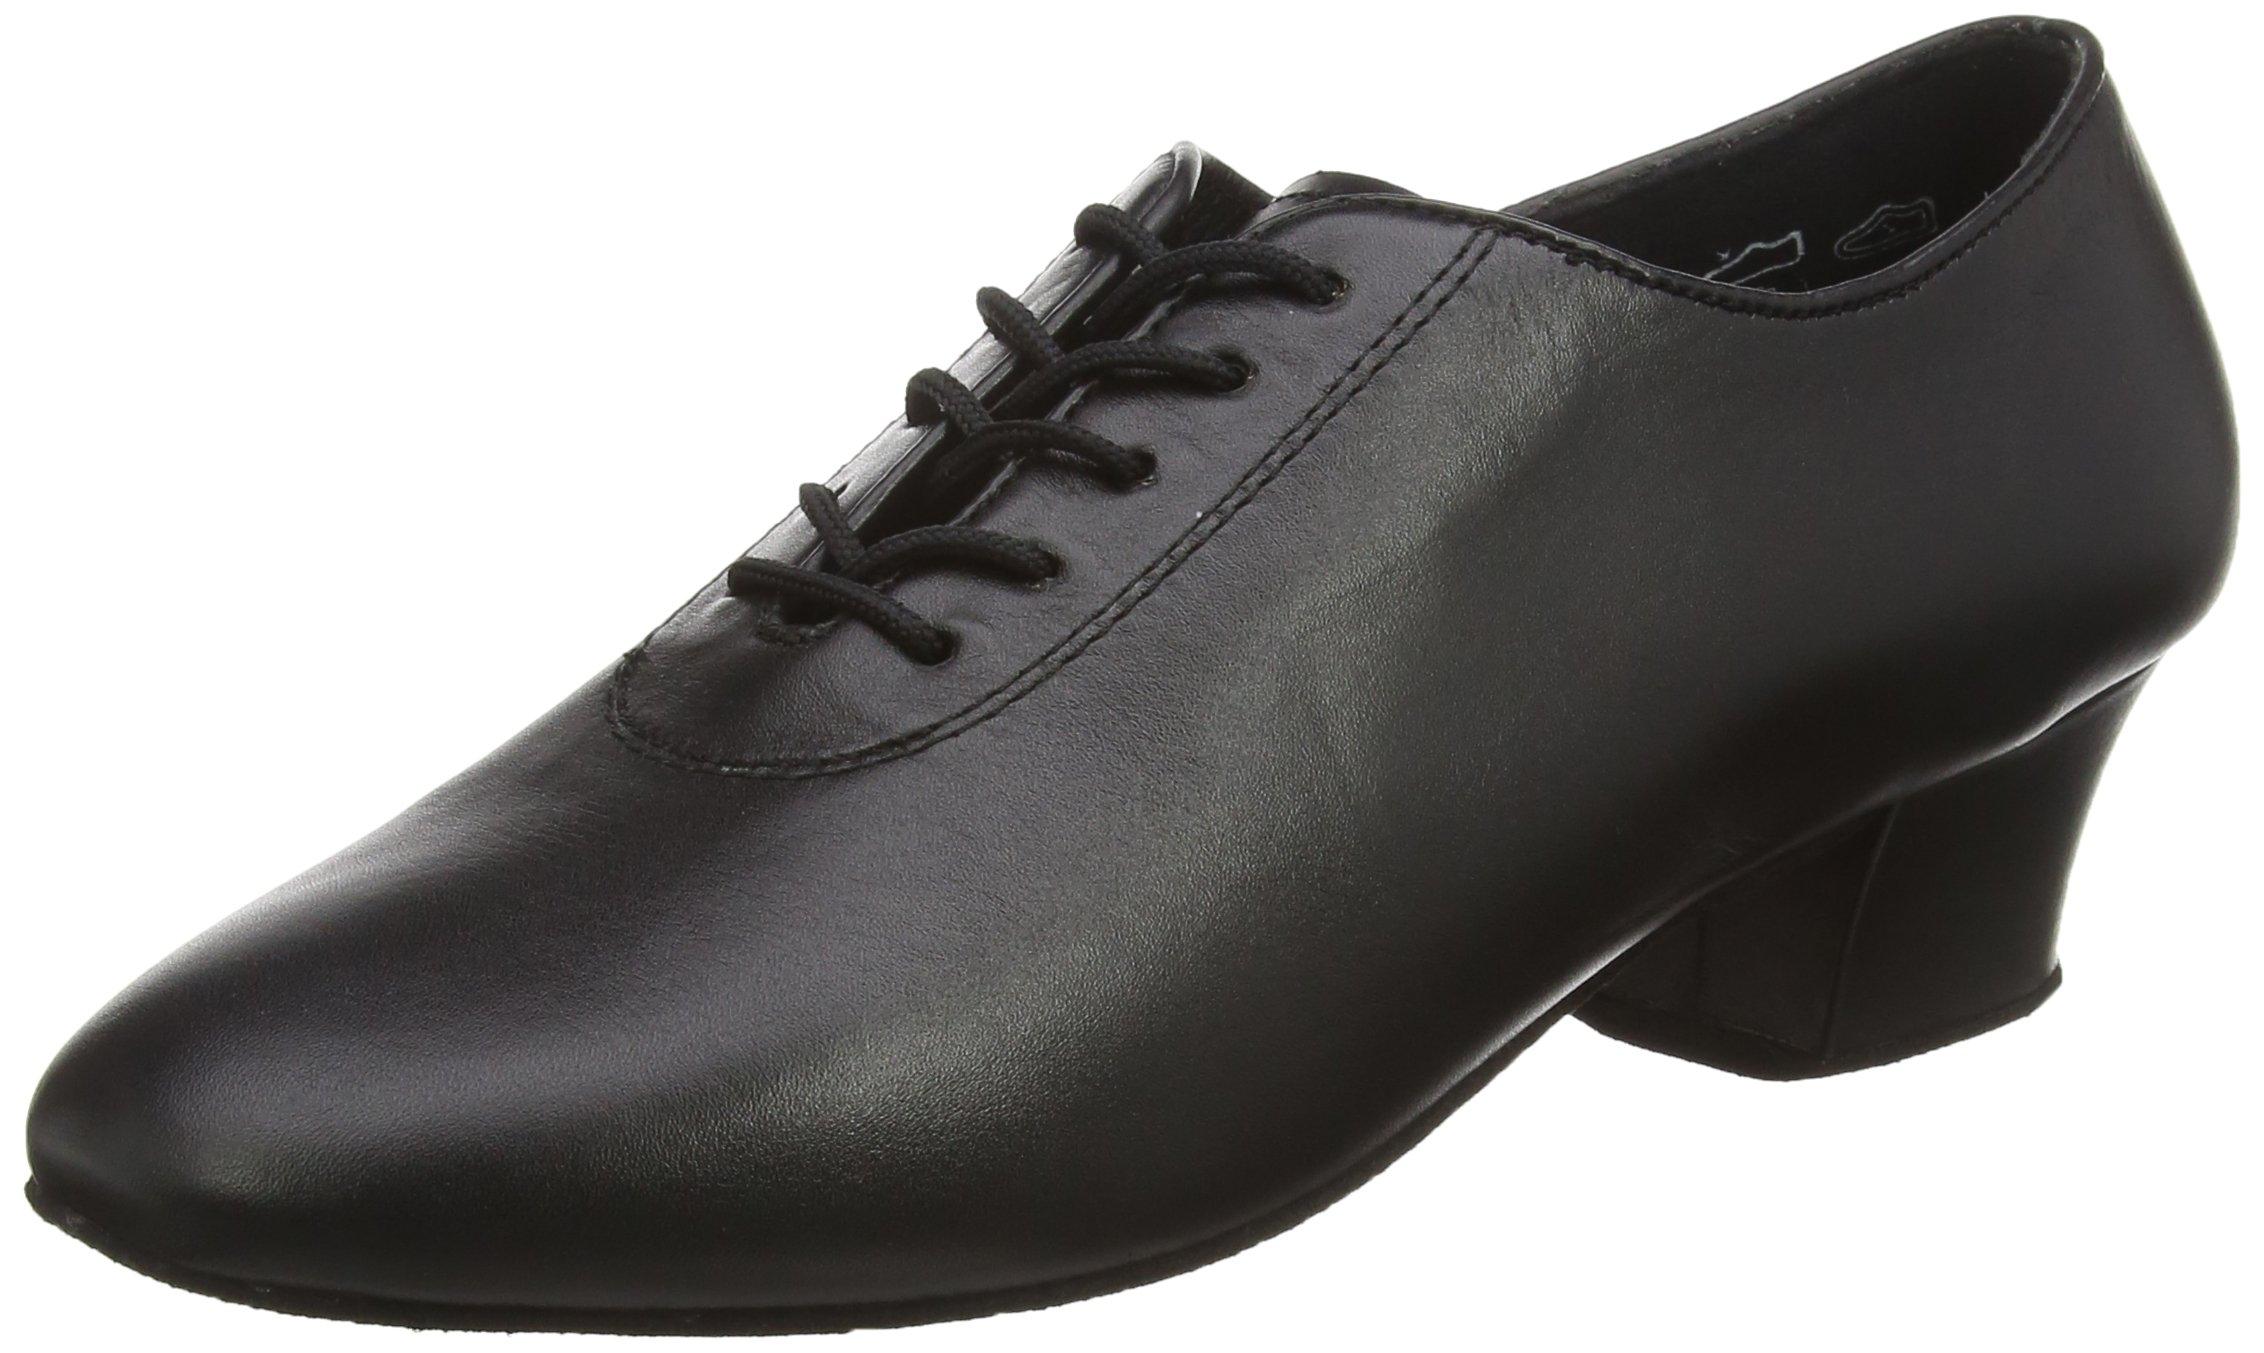 Diamant Men's Model 091 Latin Dance Shoe - 1 1/2'' (4 cm) Cuban Heel, 11 M US (10.5 UK) by Diamant